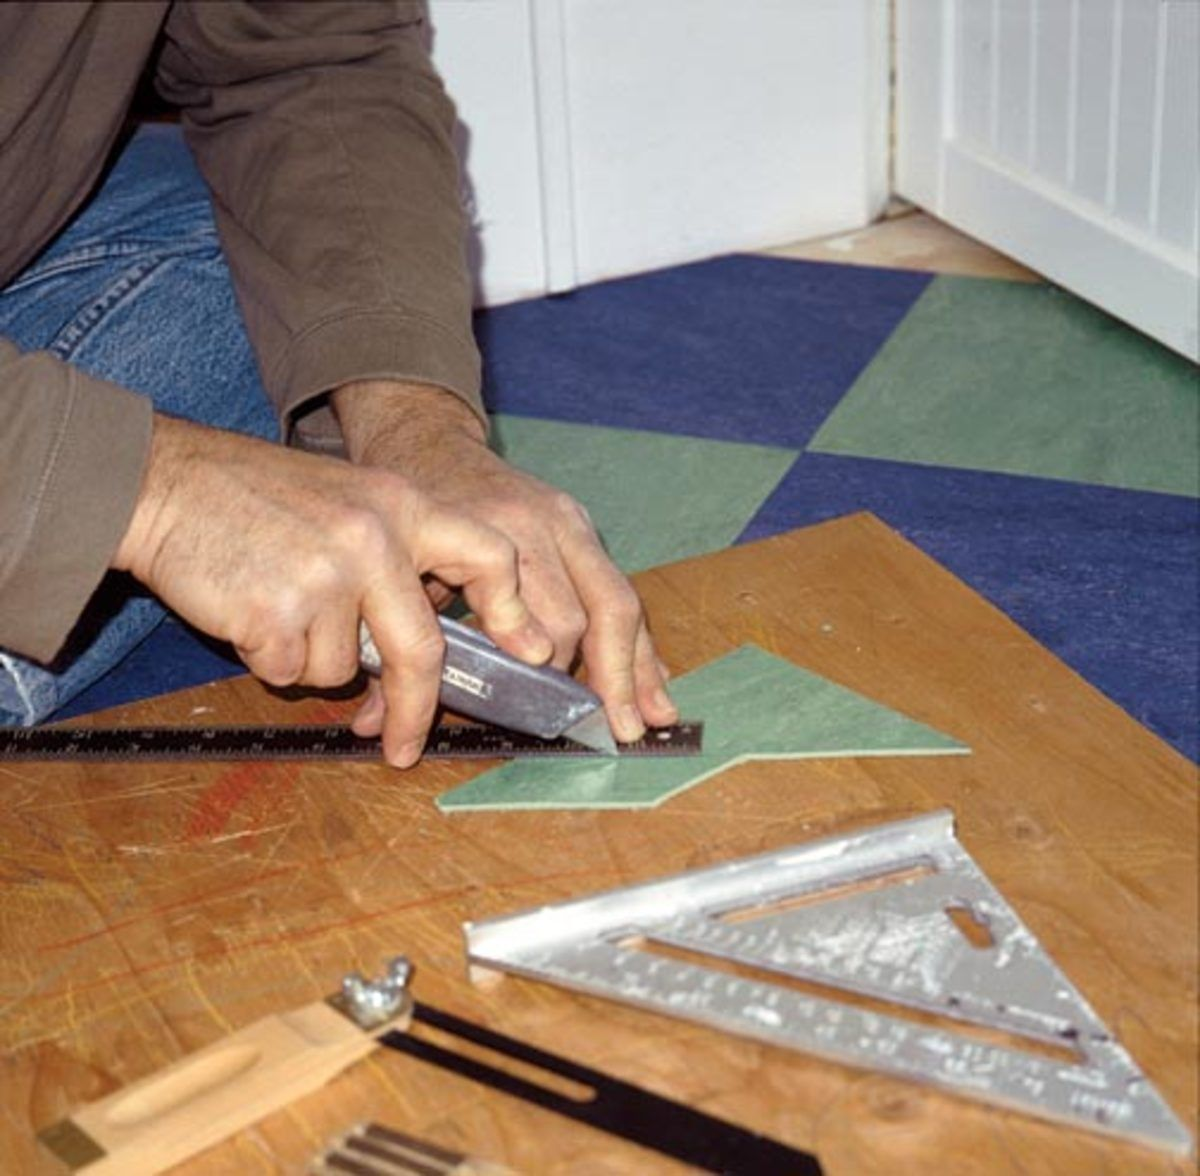 How To Lay Linoleum Tile Linoleum flooring, Stick on